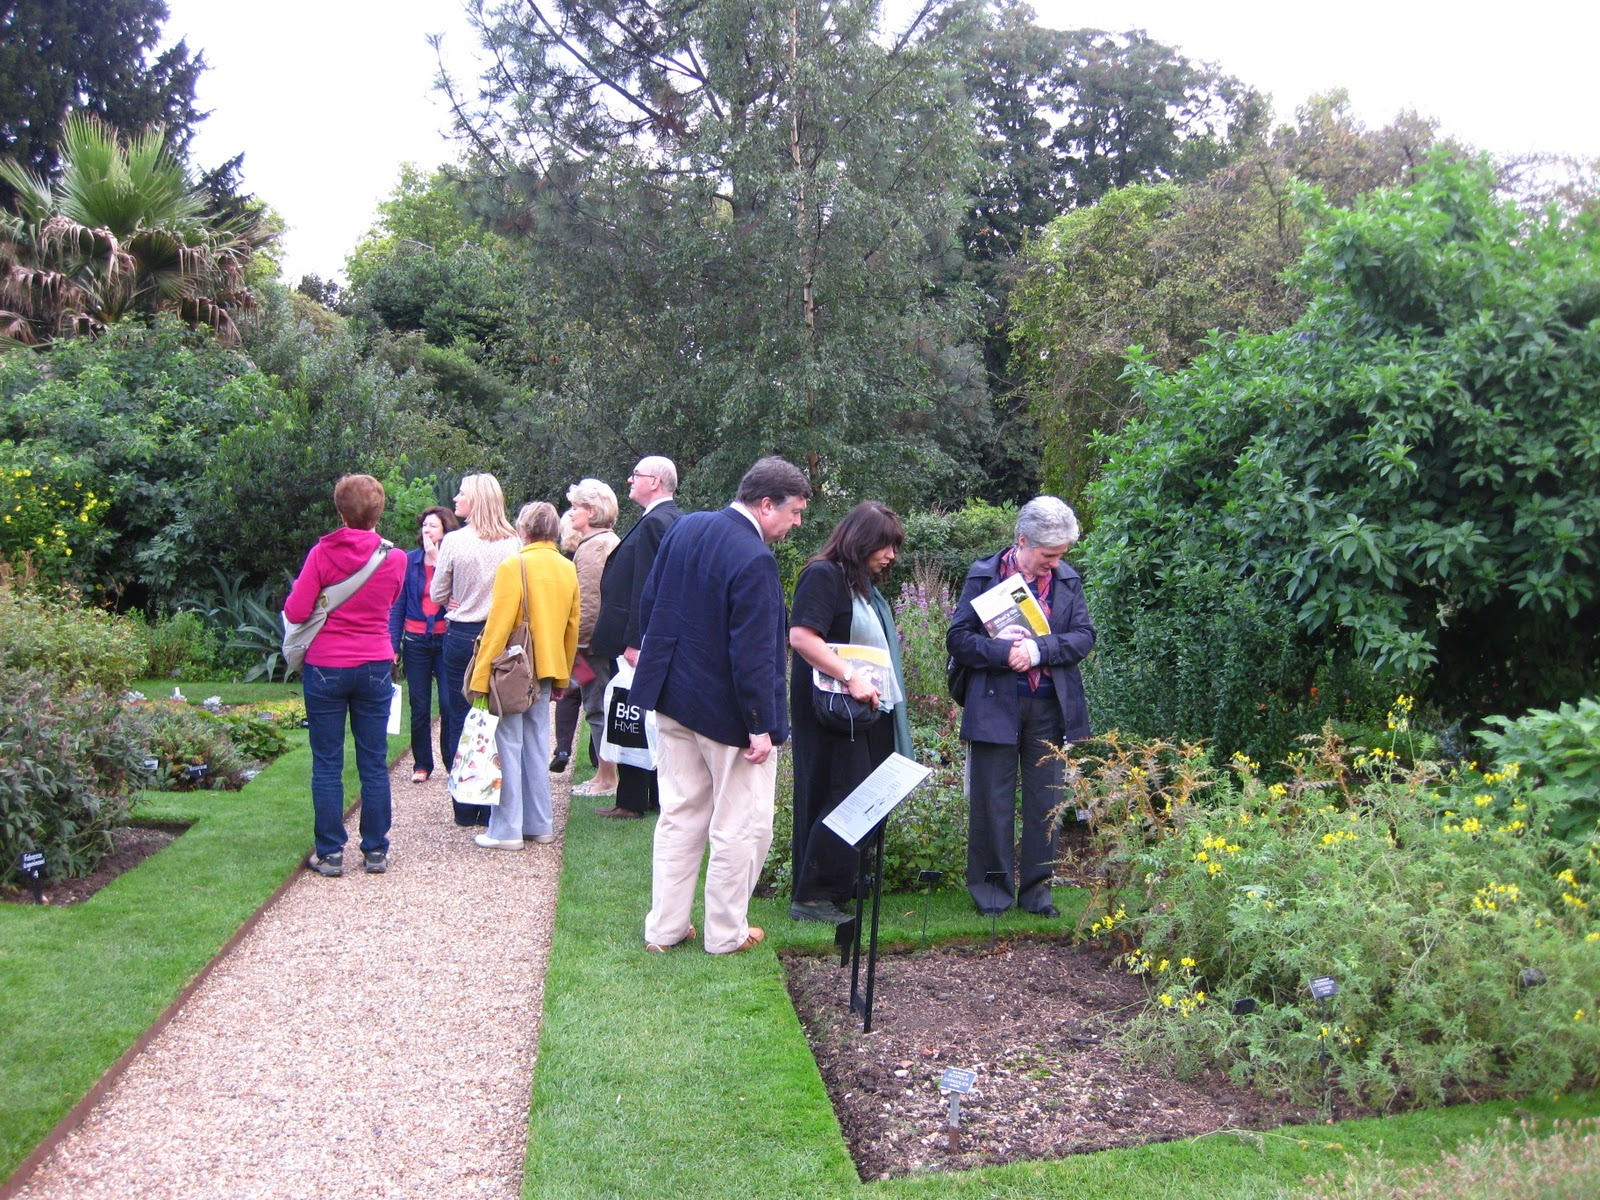 Physic garden wikipedia -  Interesting